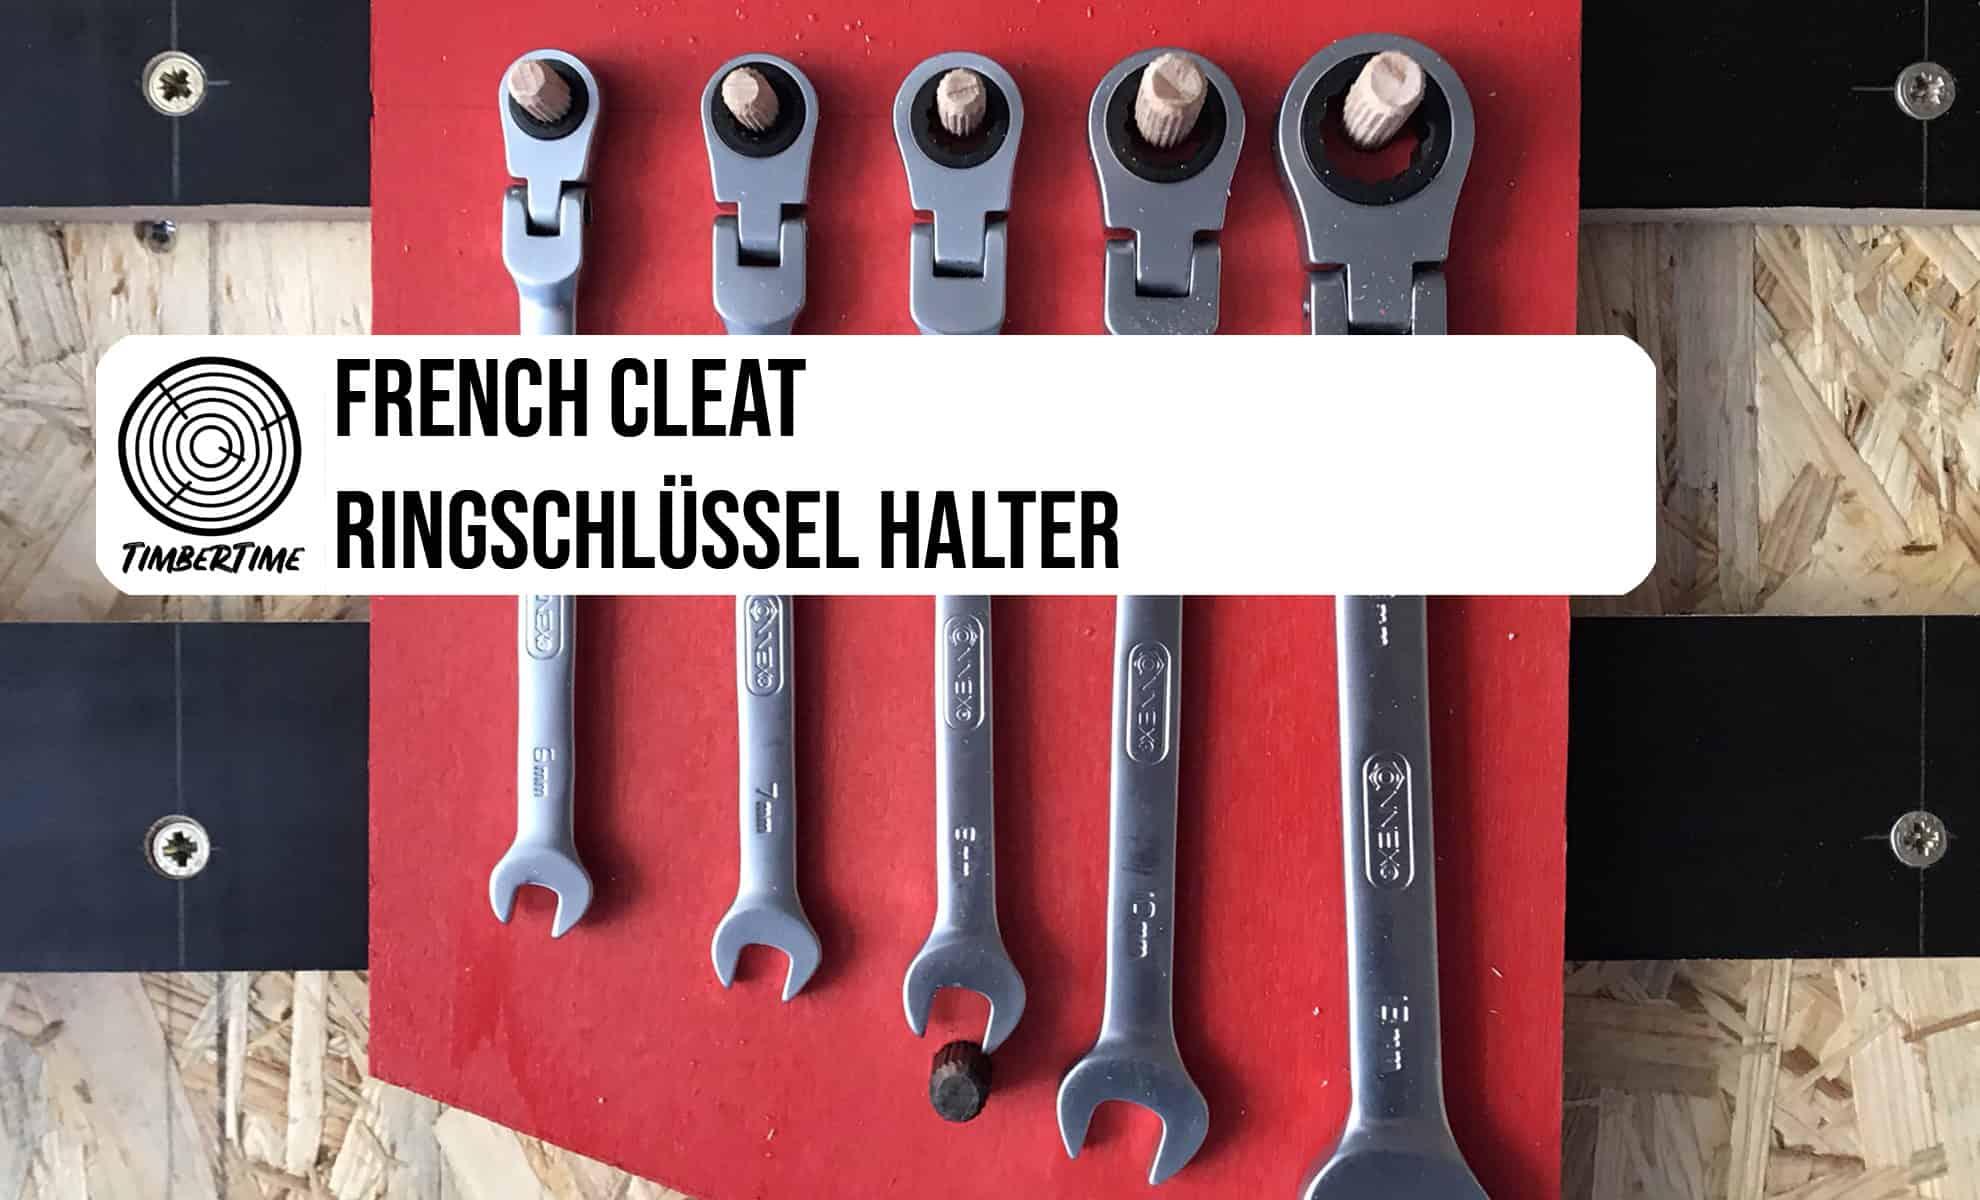 French Cleat Ringschlüssel Halter